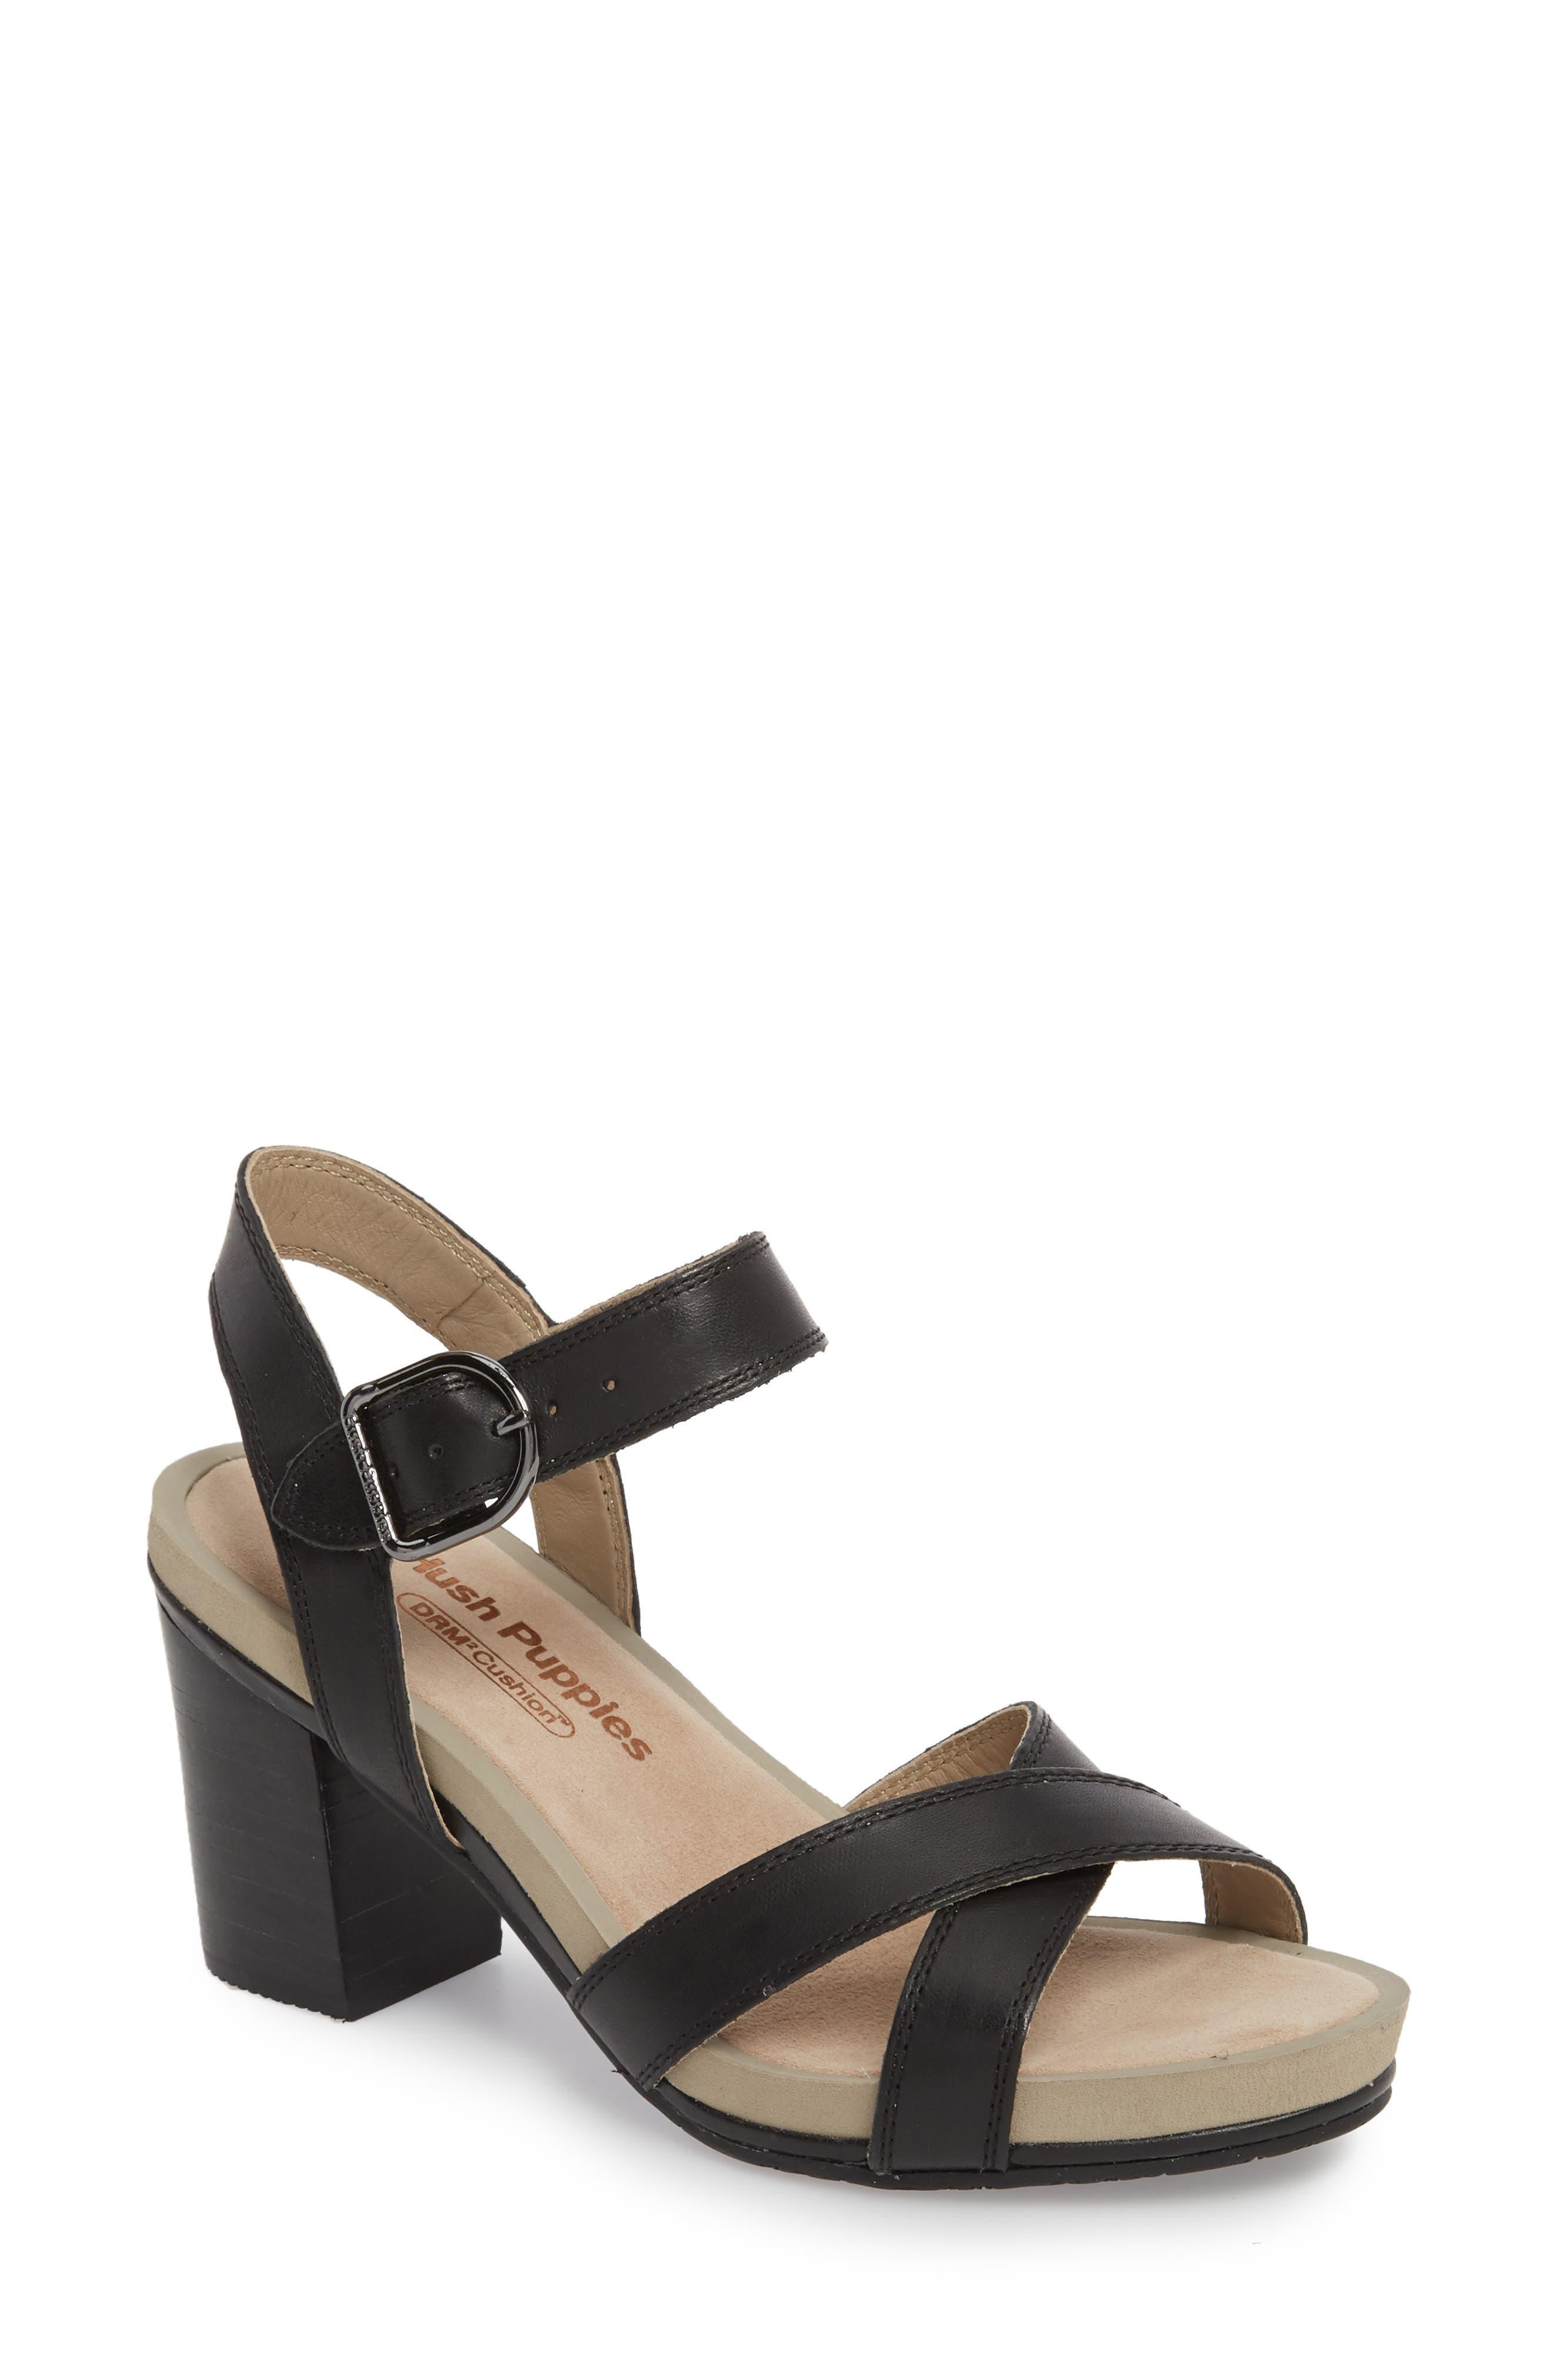 Mariska Block Heel Sandal,                         Main,                         color, Black Leather